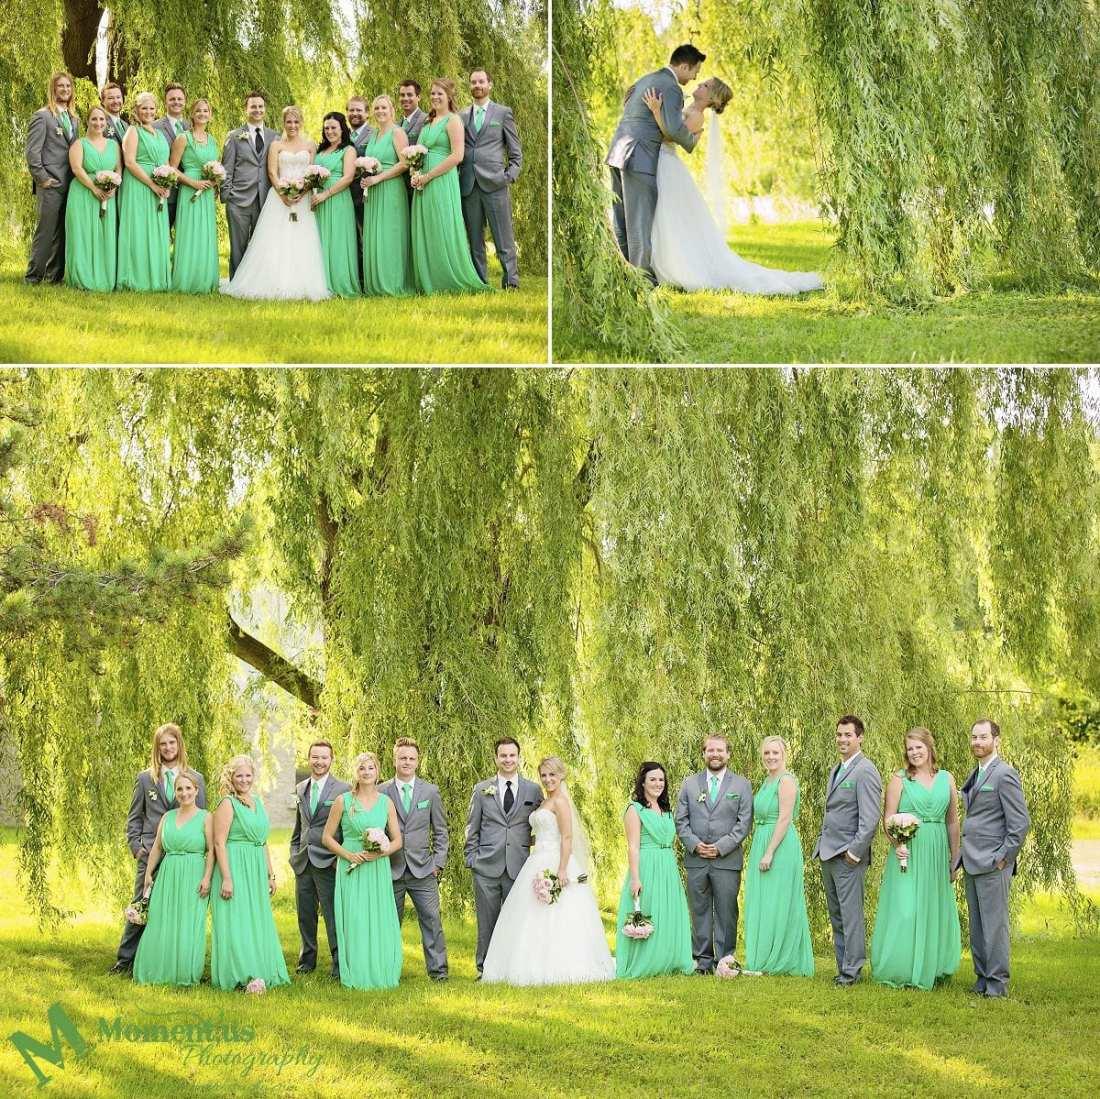 Elegant Cornwall wedding - wedding party under willow